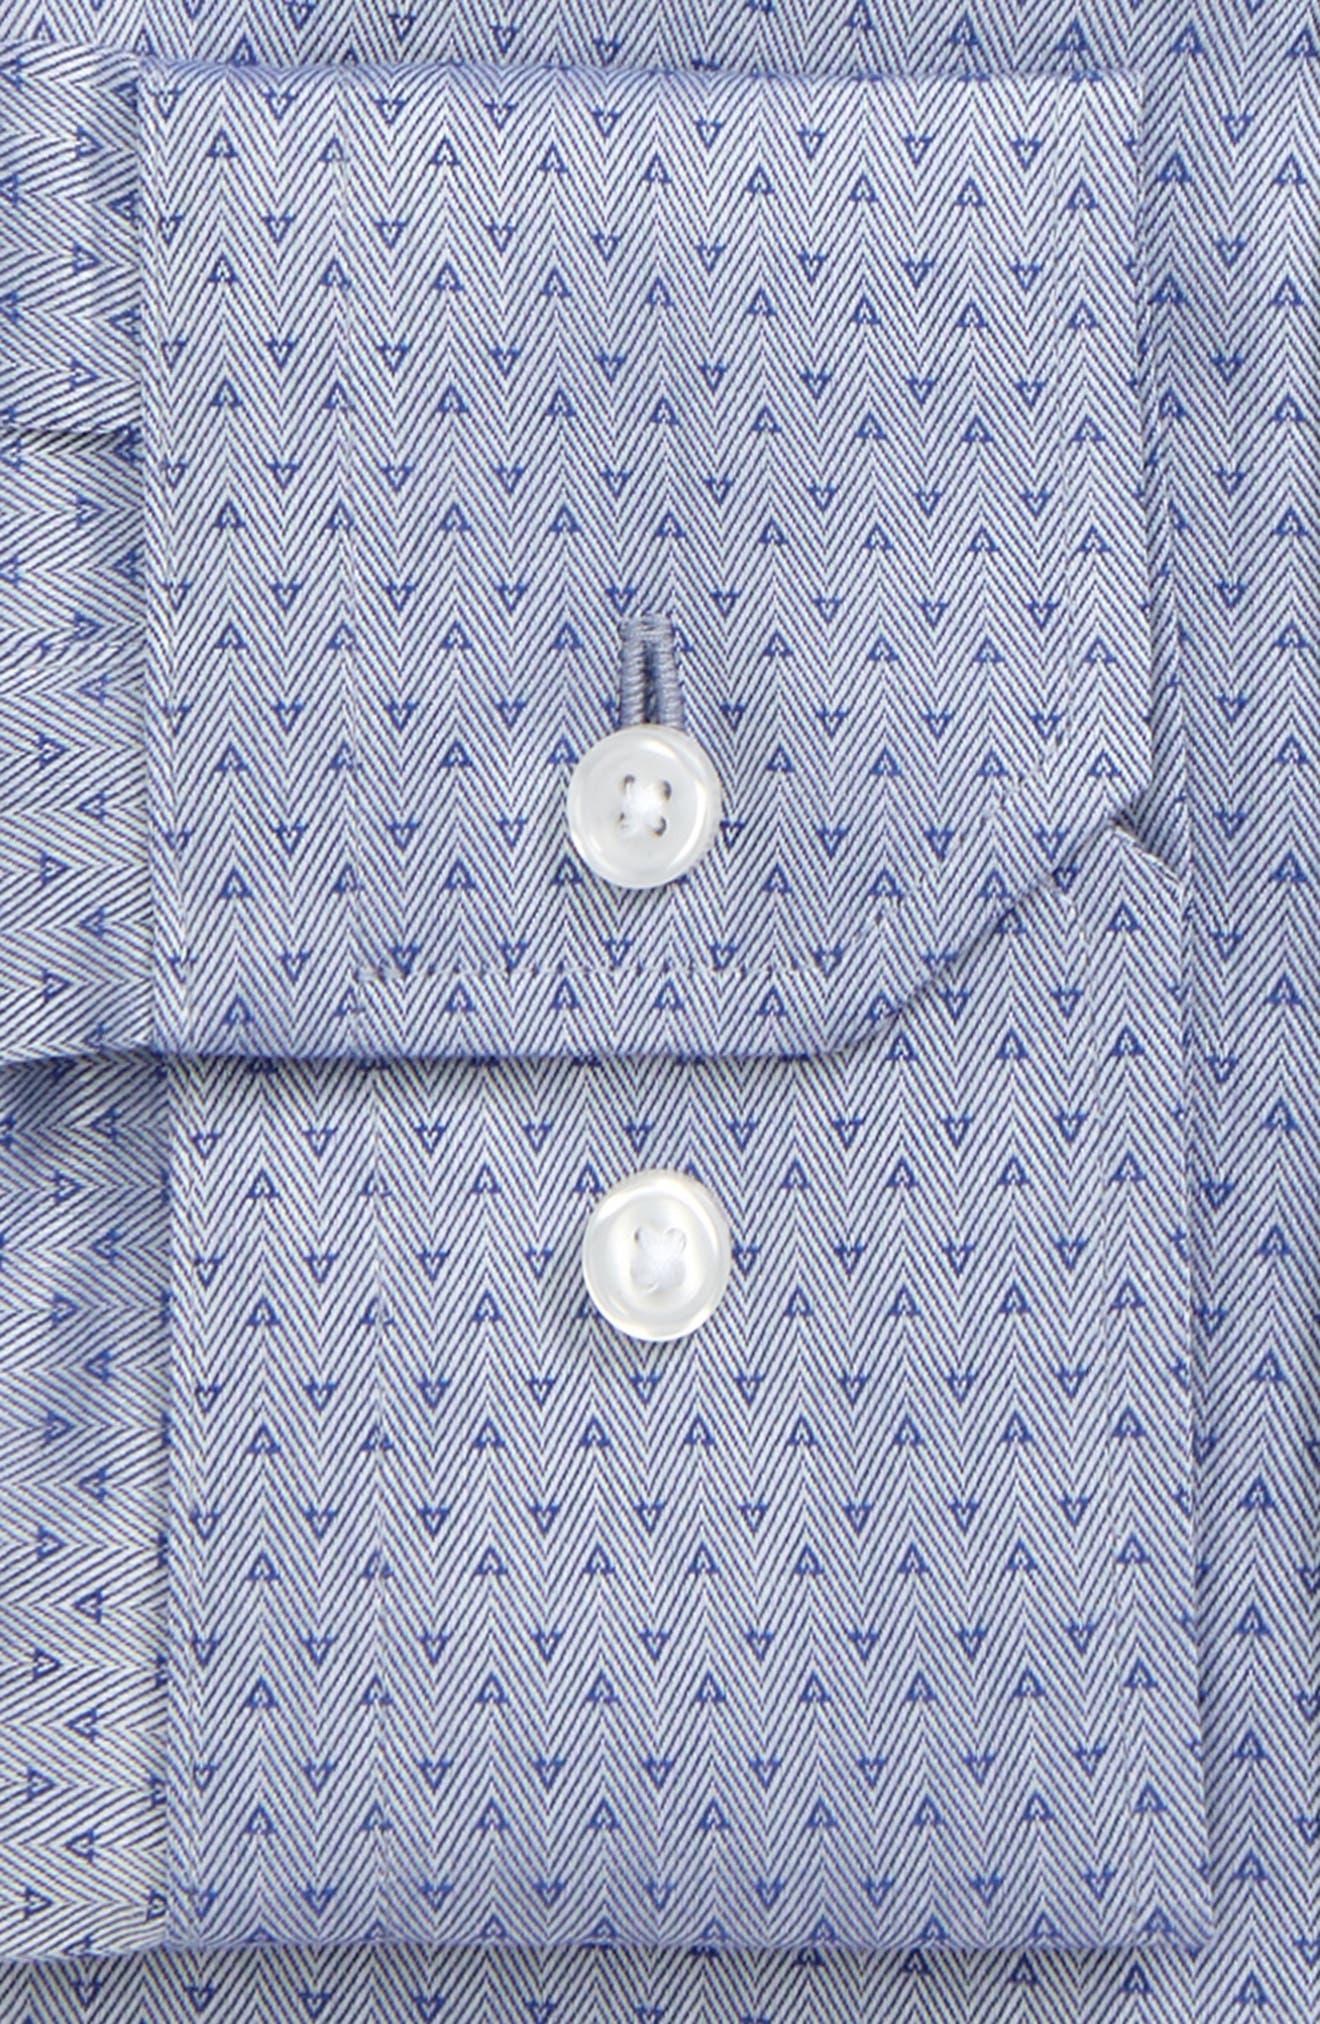 Trim Fit Print Dress Shirt,                             Alternate thumbnail 2, color,                             Blue Marine